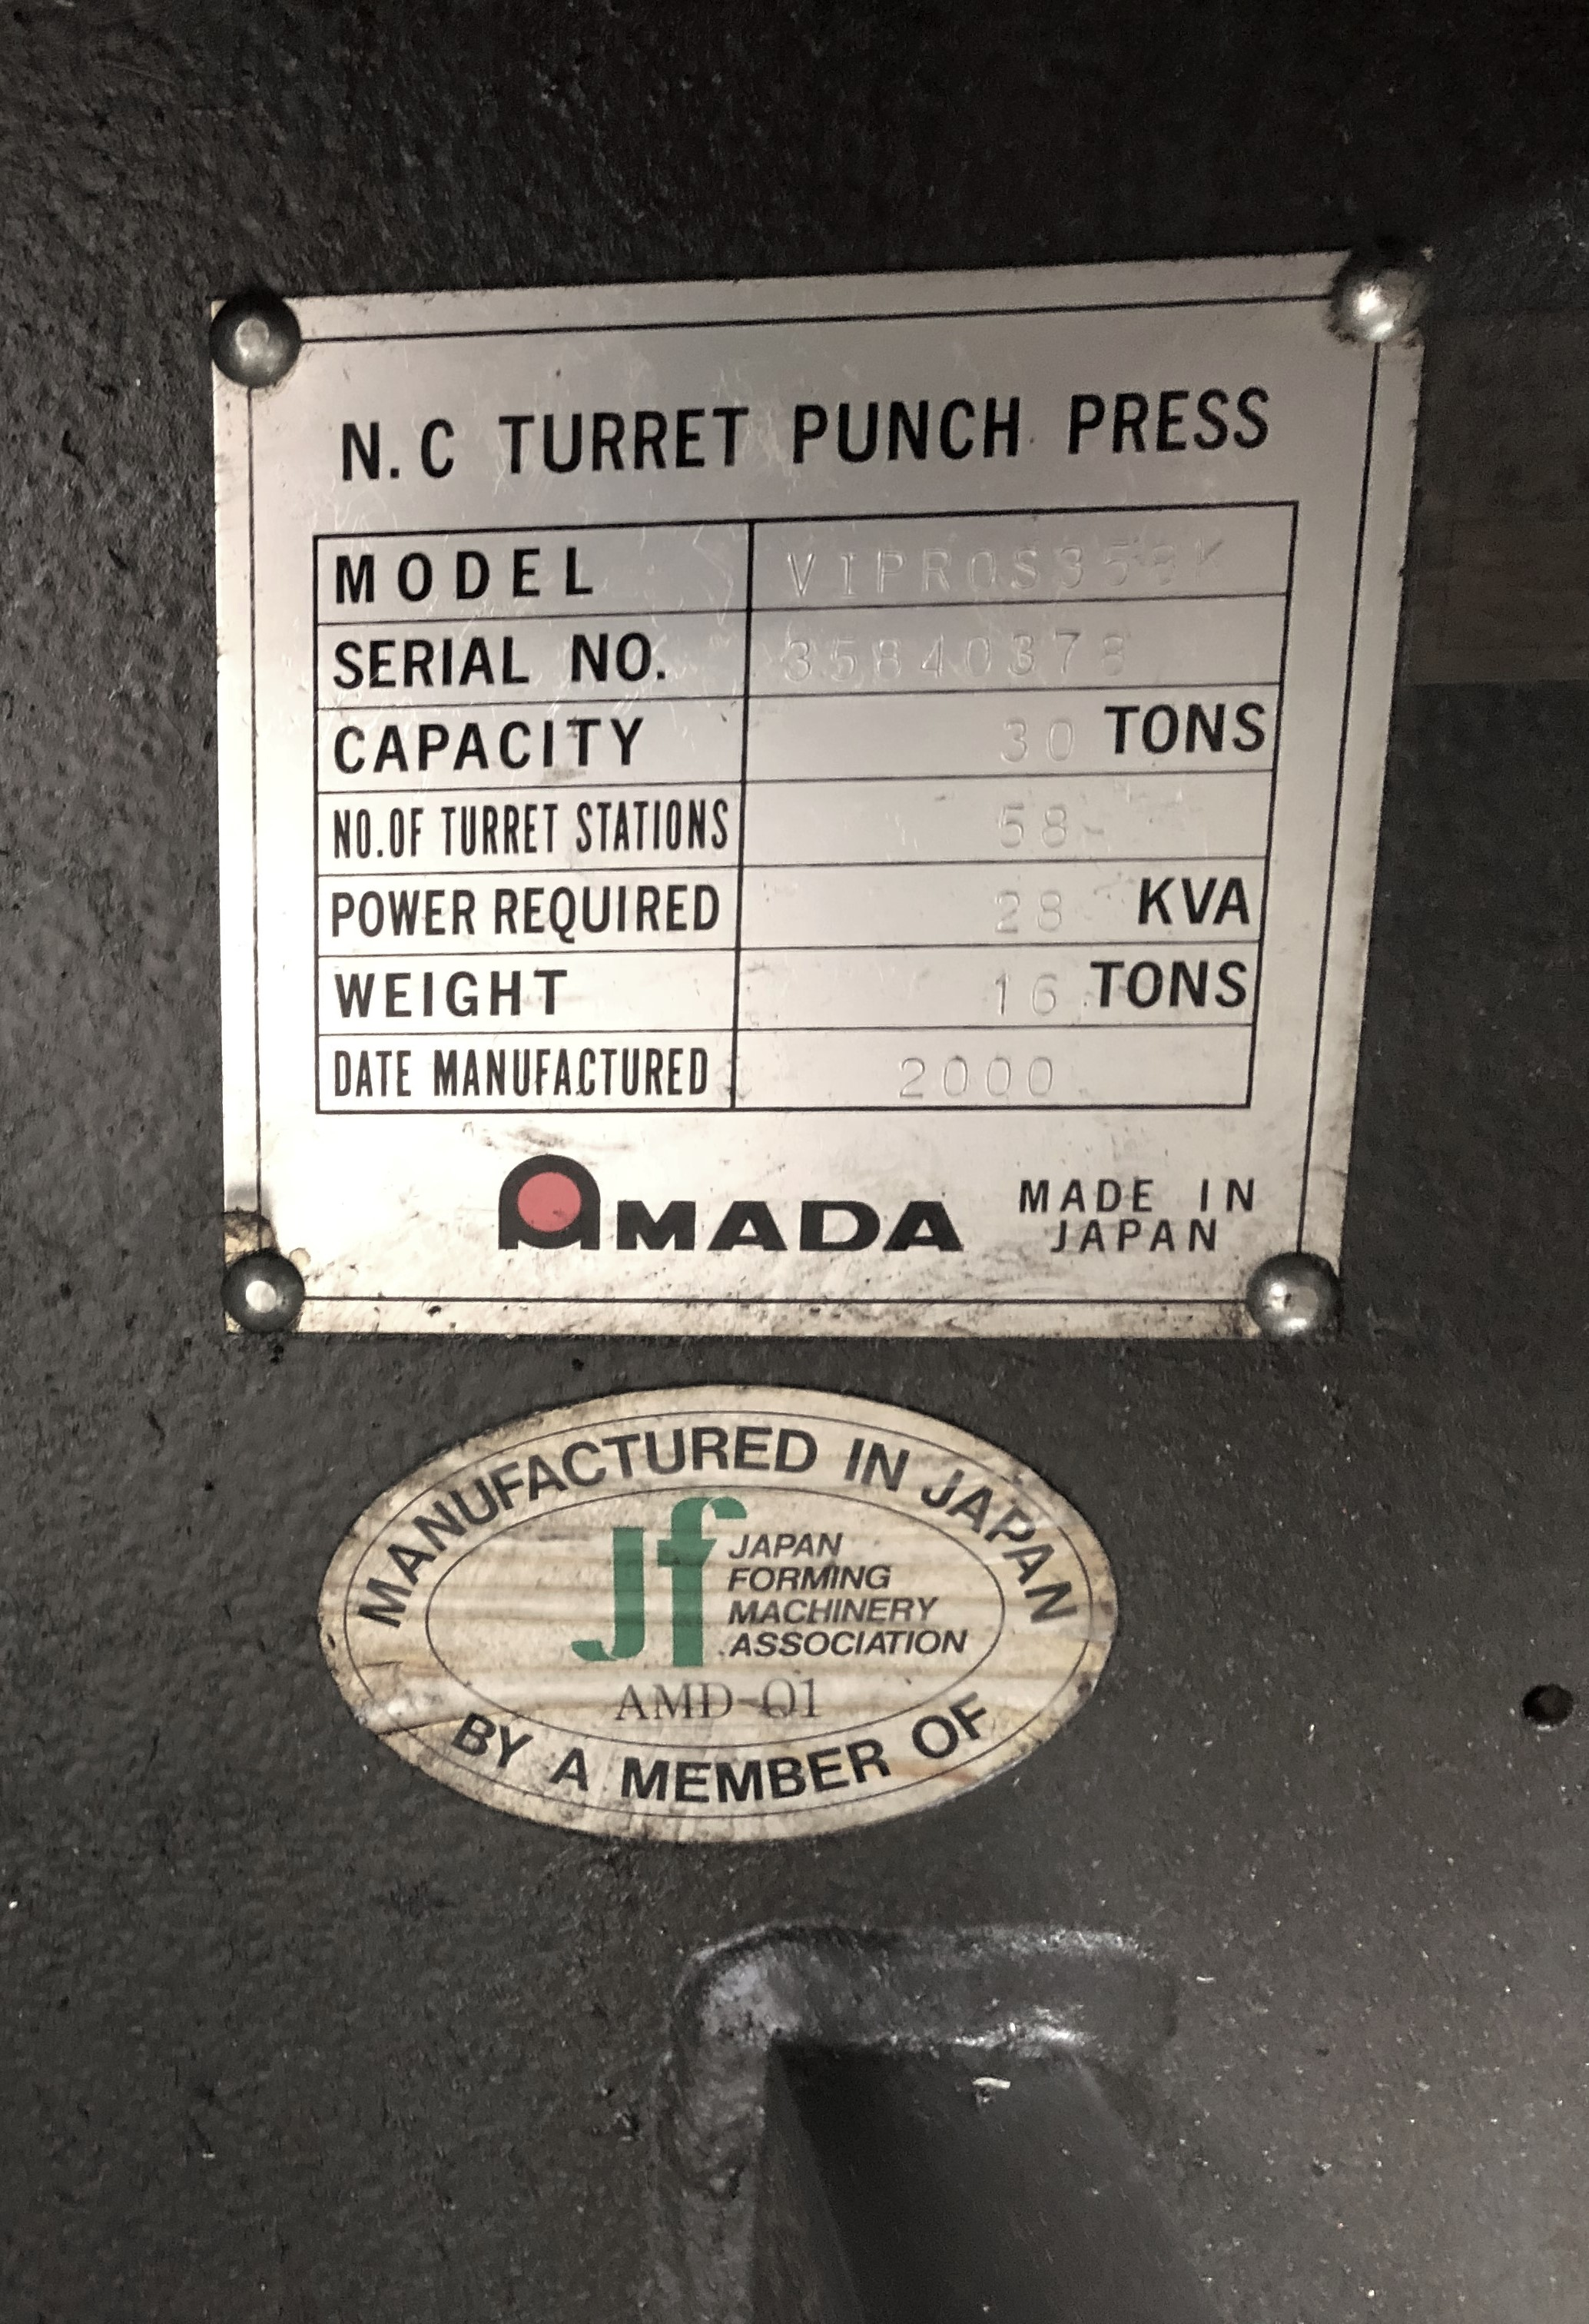 Lot 12 - AMADA MODEL VIPROS 358 KINGII CNC TURRET PUNCH, FANUC SERIES 18-P CNC CONTROL, 30-TON CAPACITY, 58